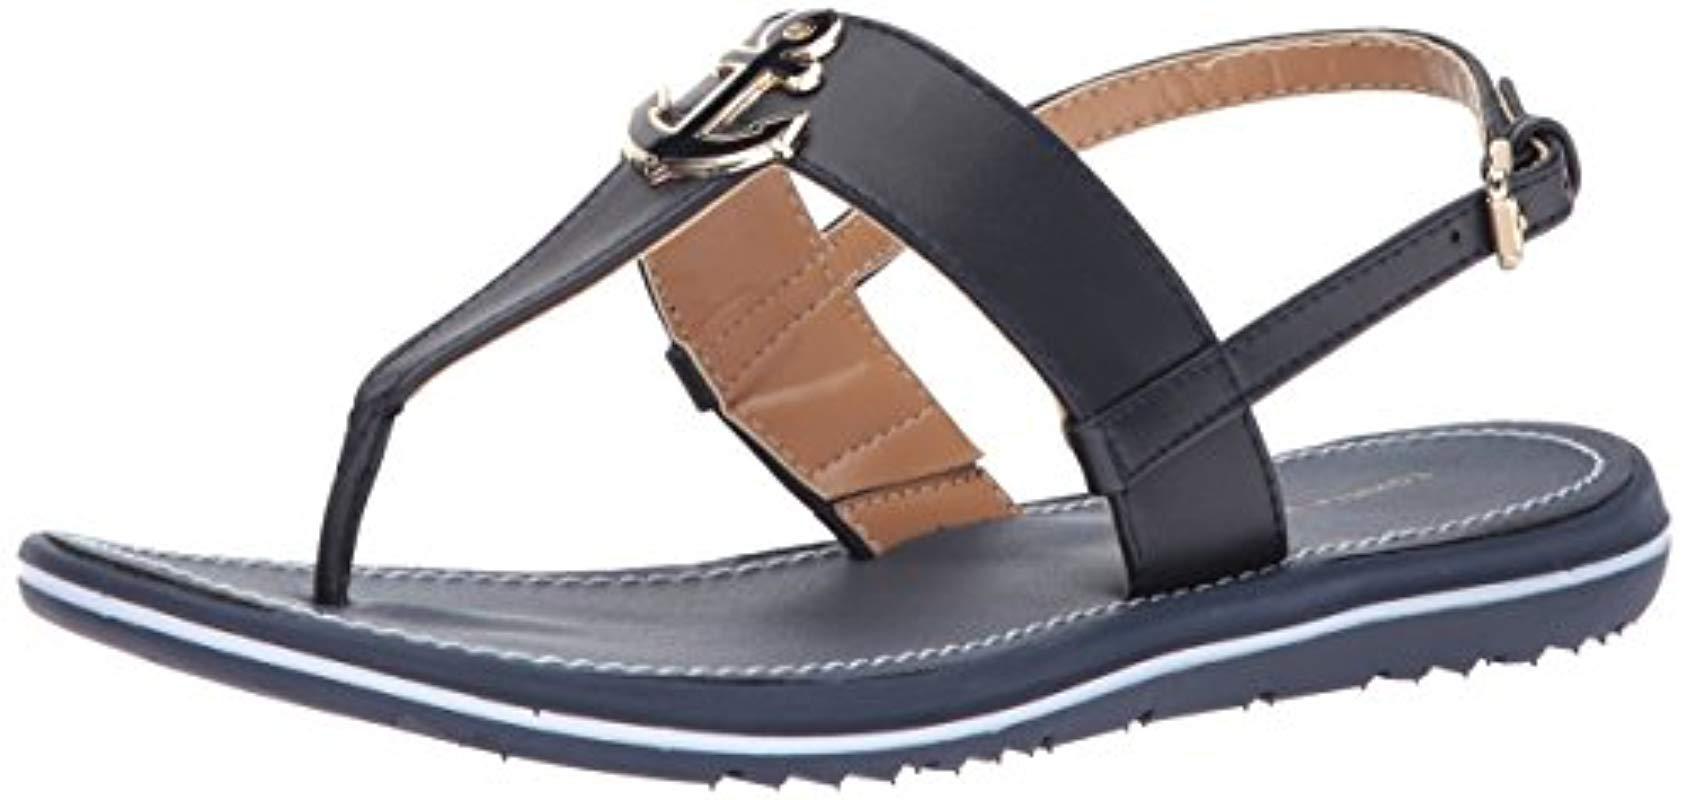 d25449a54428a6 Lyst - Tommy Hilfiger Galiant Flat Sandal in Blue